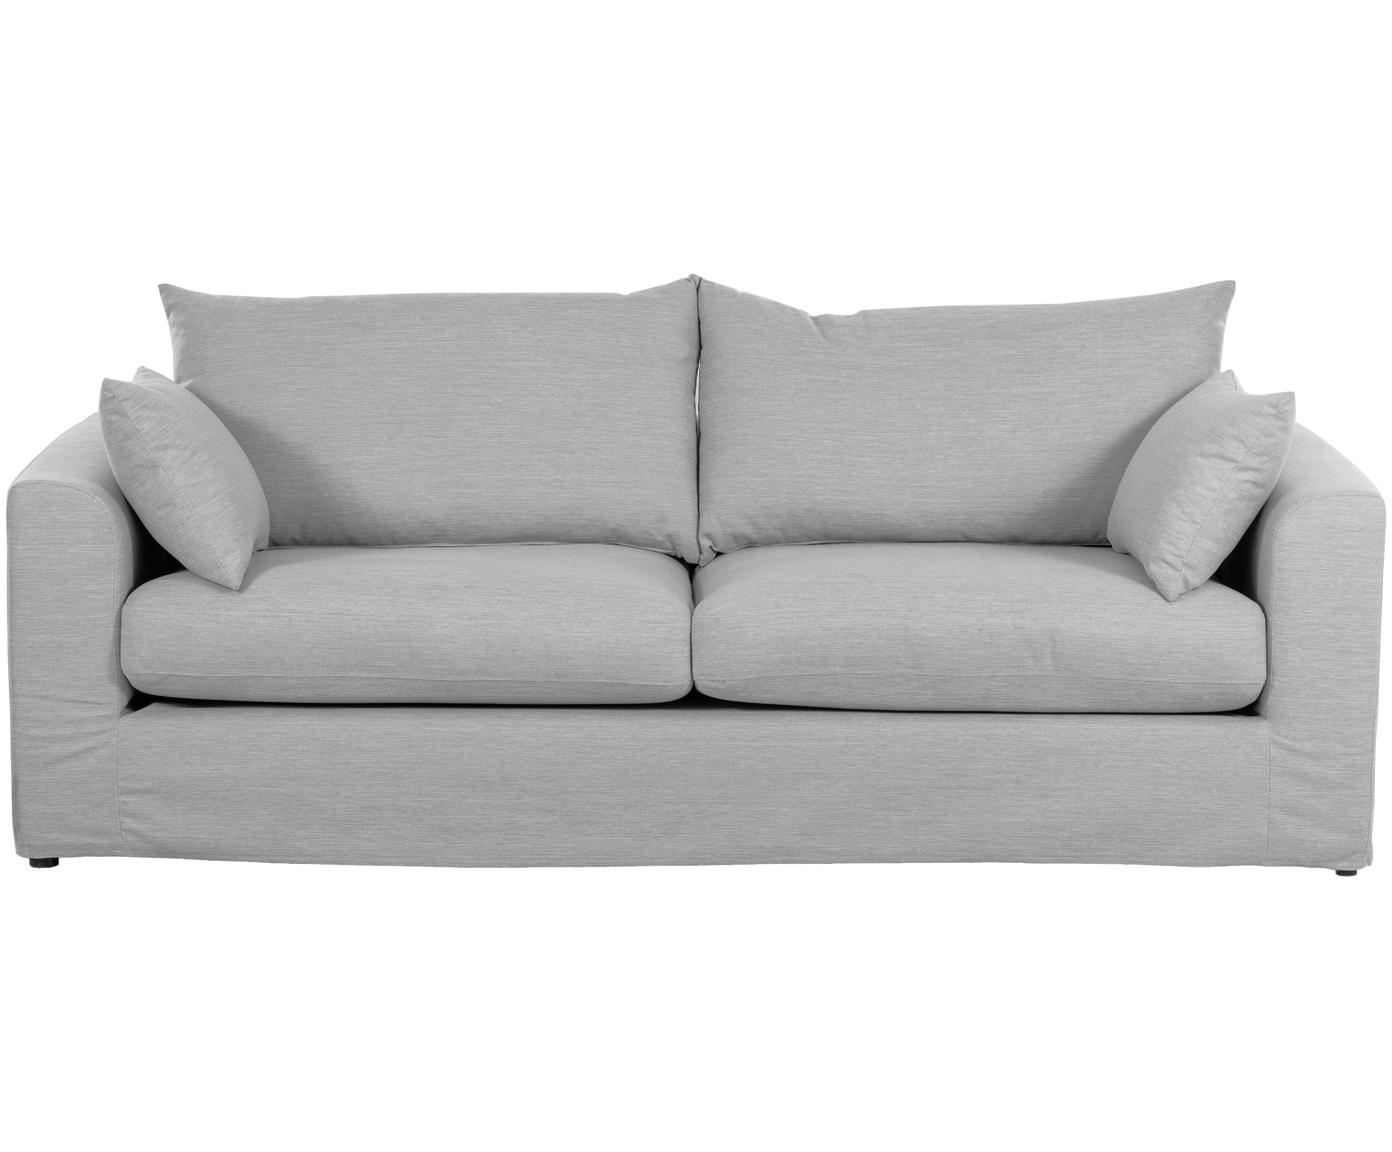 Sofa Zach (3-Sitzer), Bezug: 100% Polypropylen, Webstoff Grau, B 231 x T 90 cm